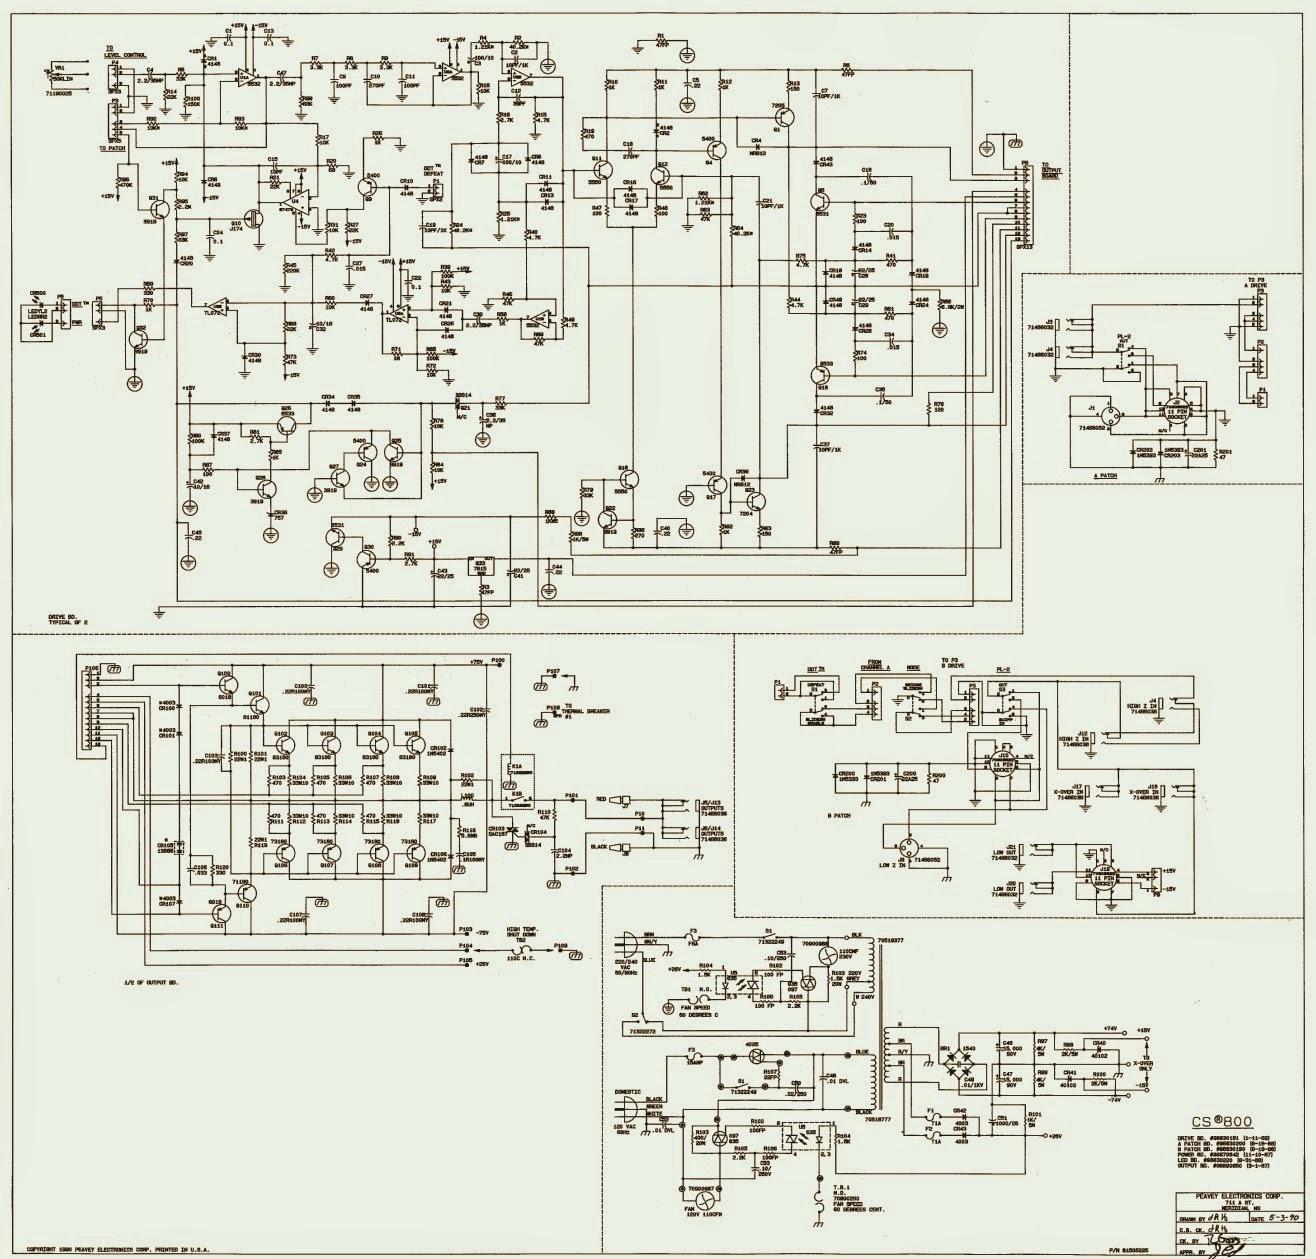 medium resolution of peavey cs 800 diagram schematic wiring diagrams u2022 gibson wiring diagrams peavey wiring diagrams